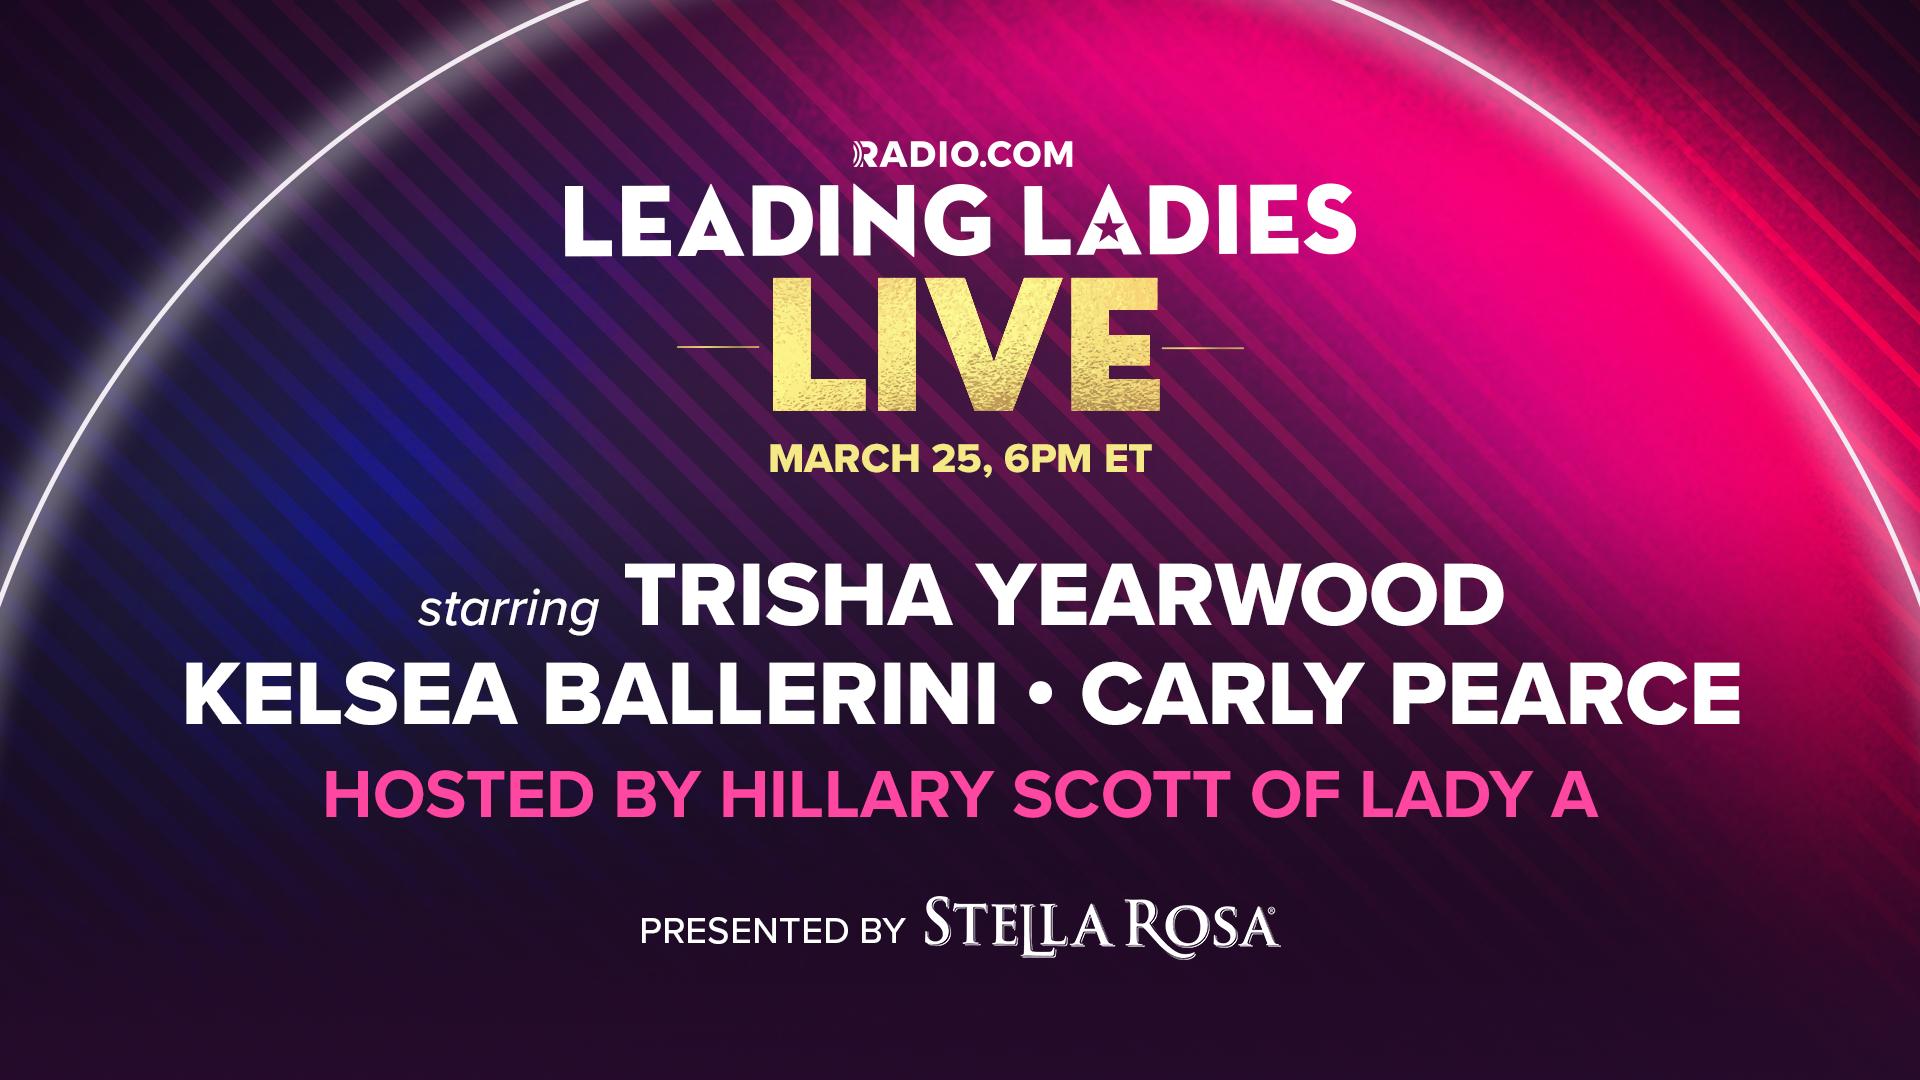 RADIO.COM presents 'Leading Ladies Live' with Trisha Yearwood, Kelsea Ballerini, and Carly Pearce